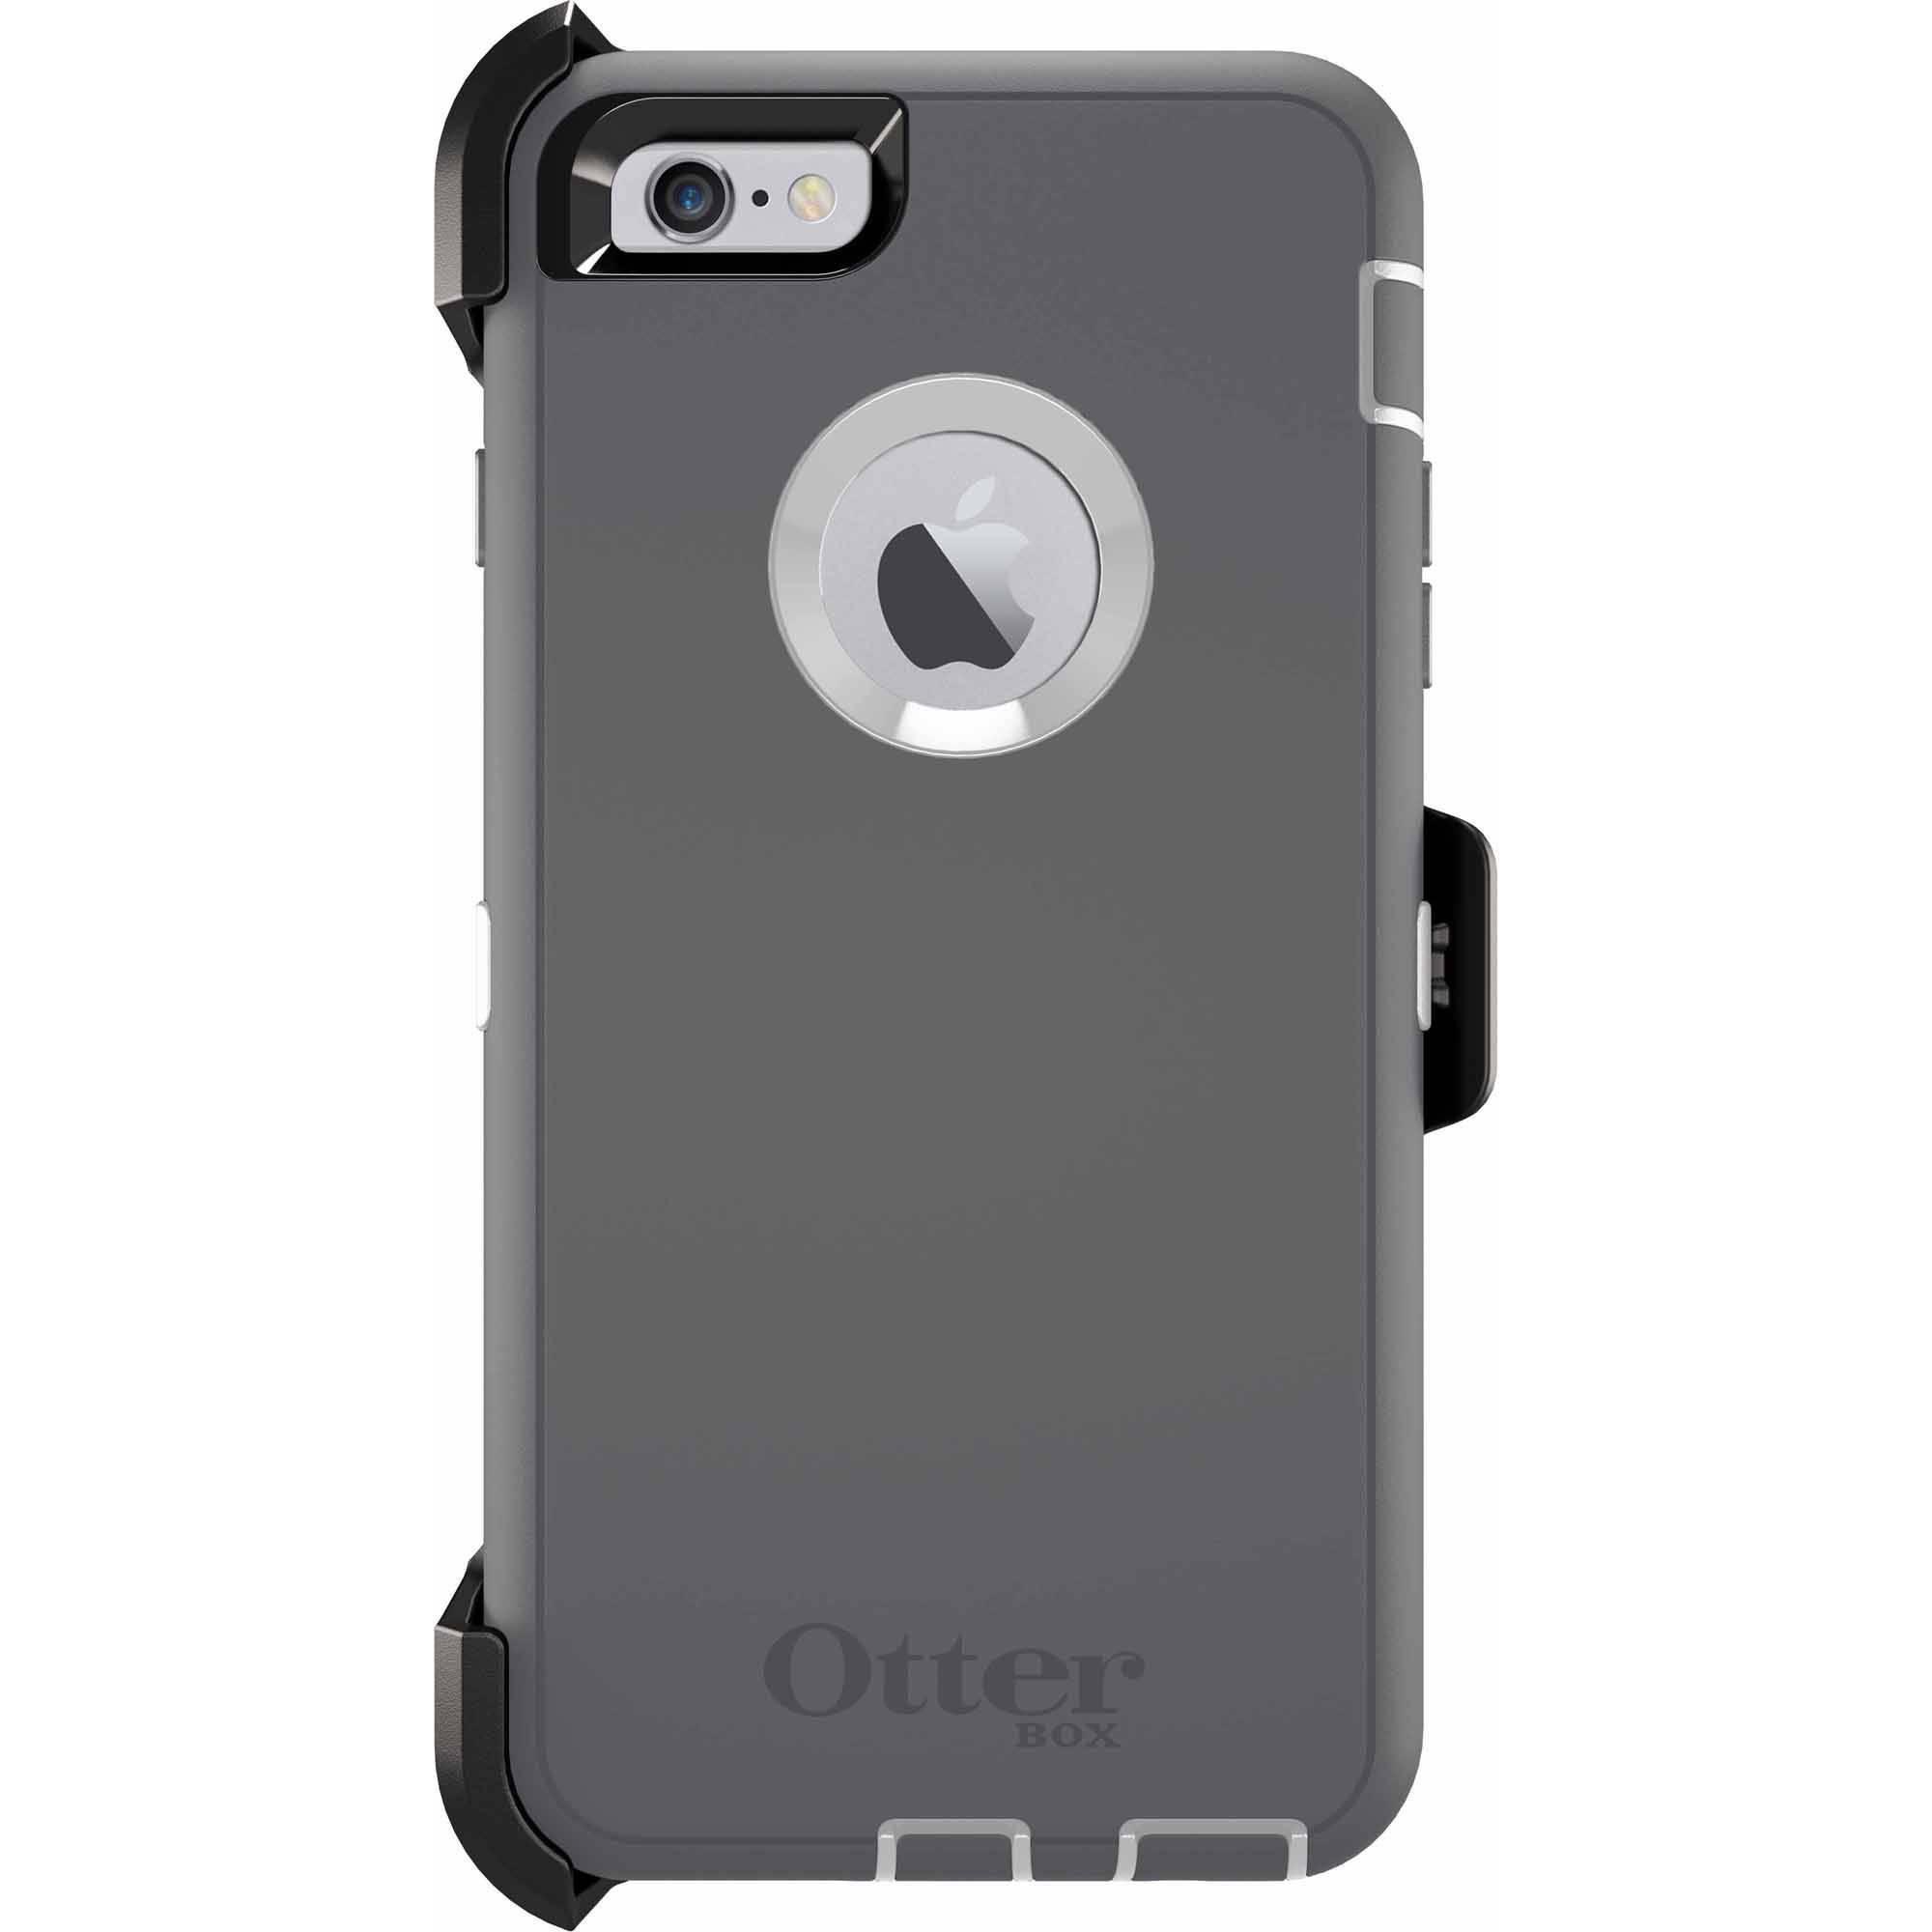 Ot otterbox iphone 6s plus covers - Ot Otterbox Iphone 6s Plus Covers 1